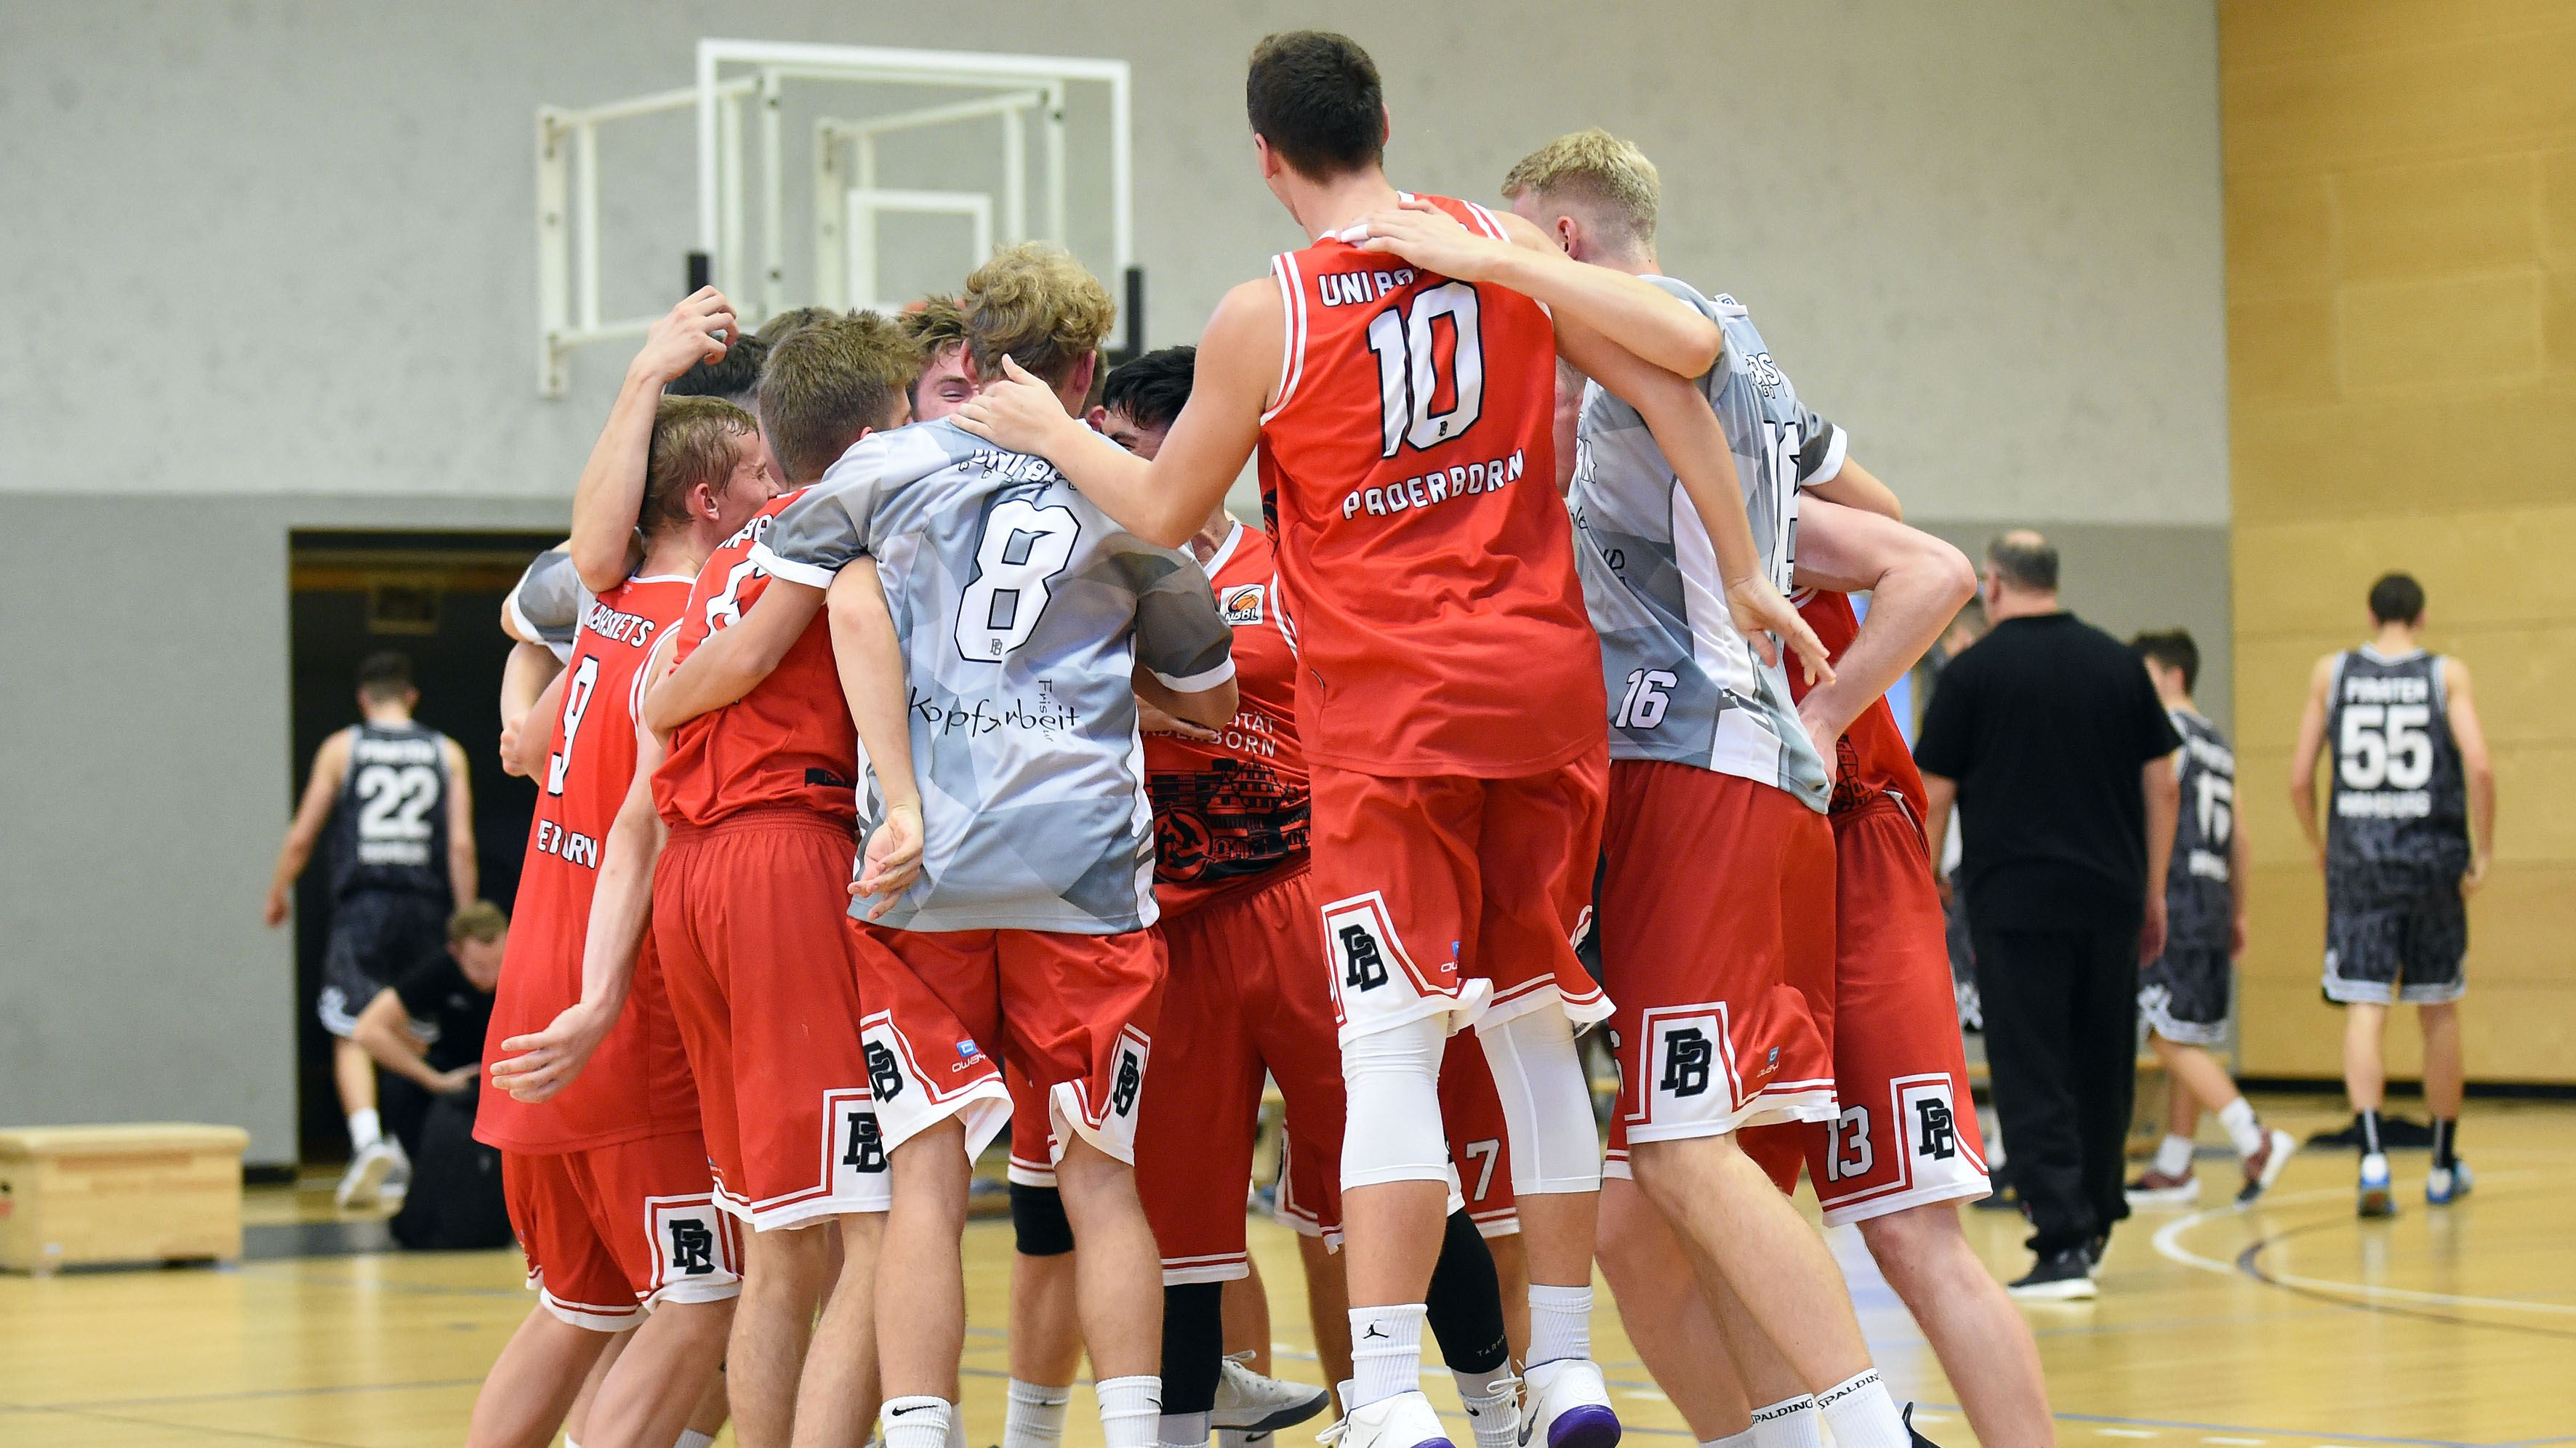 2018-10-13 NBBL Uni Baskets Paderborn vs. Piraten Hamburg_0994